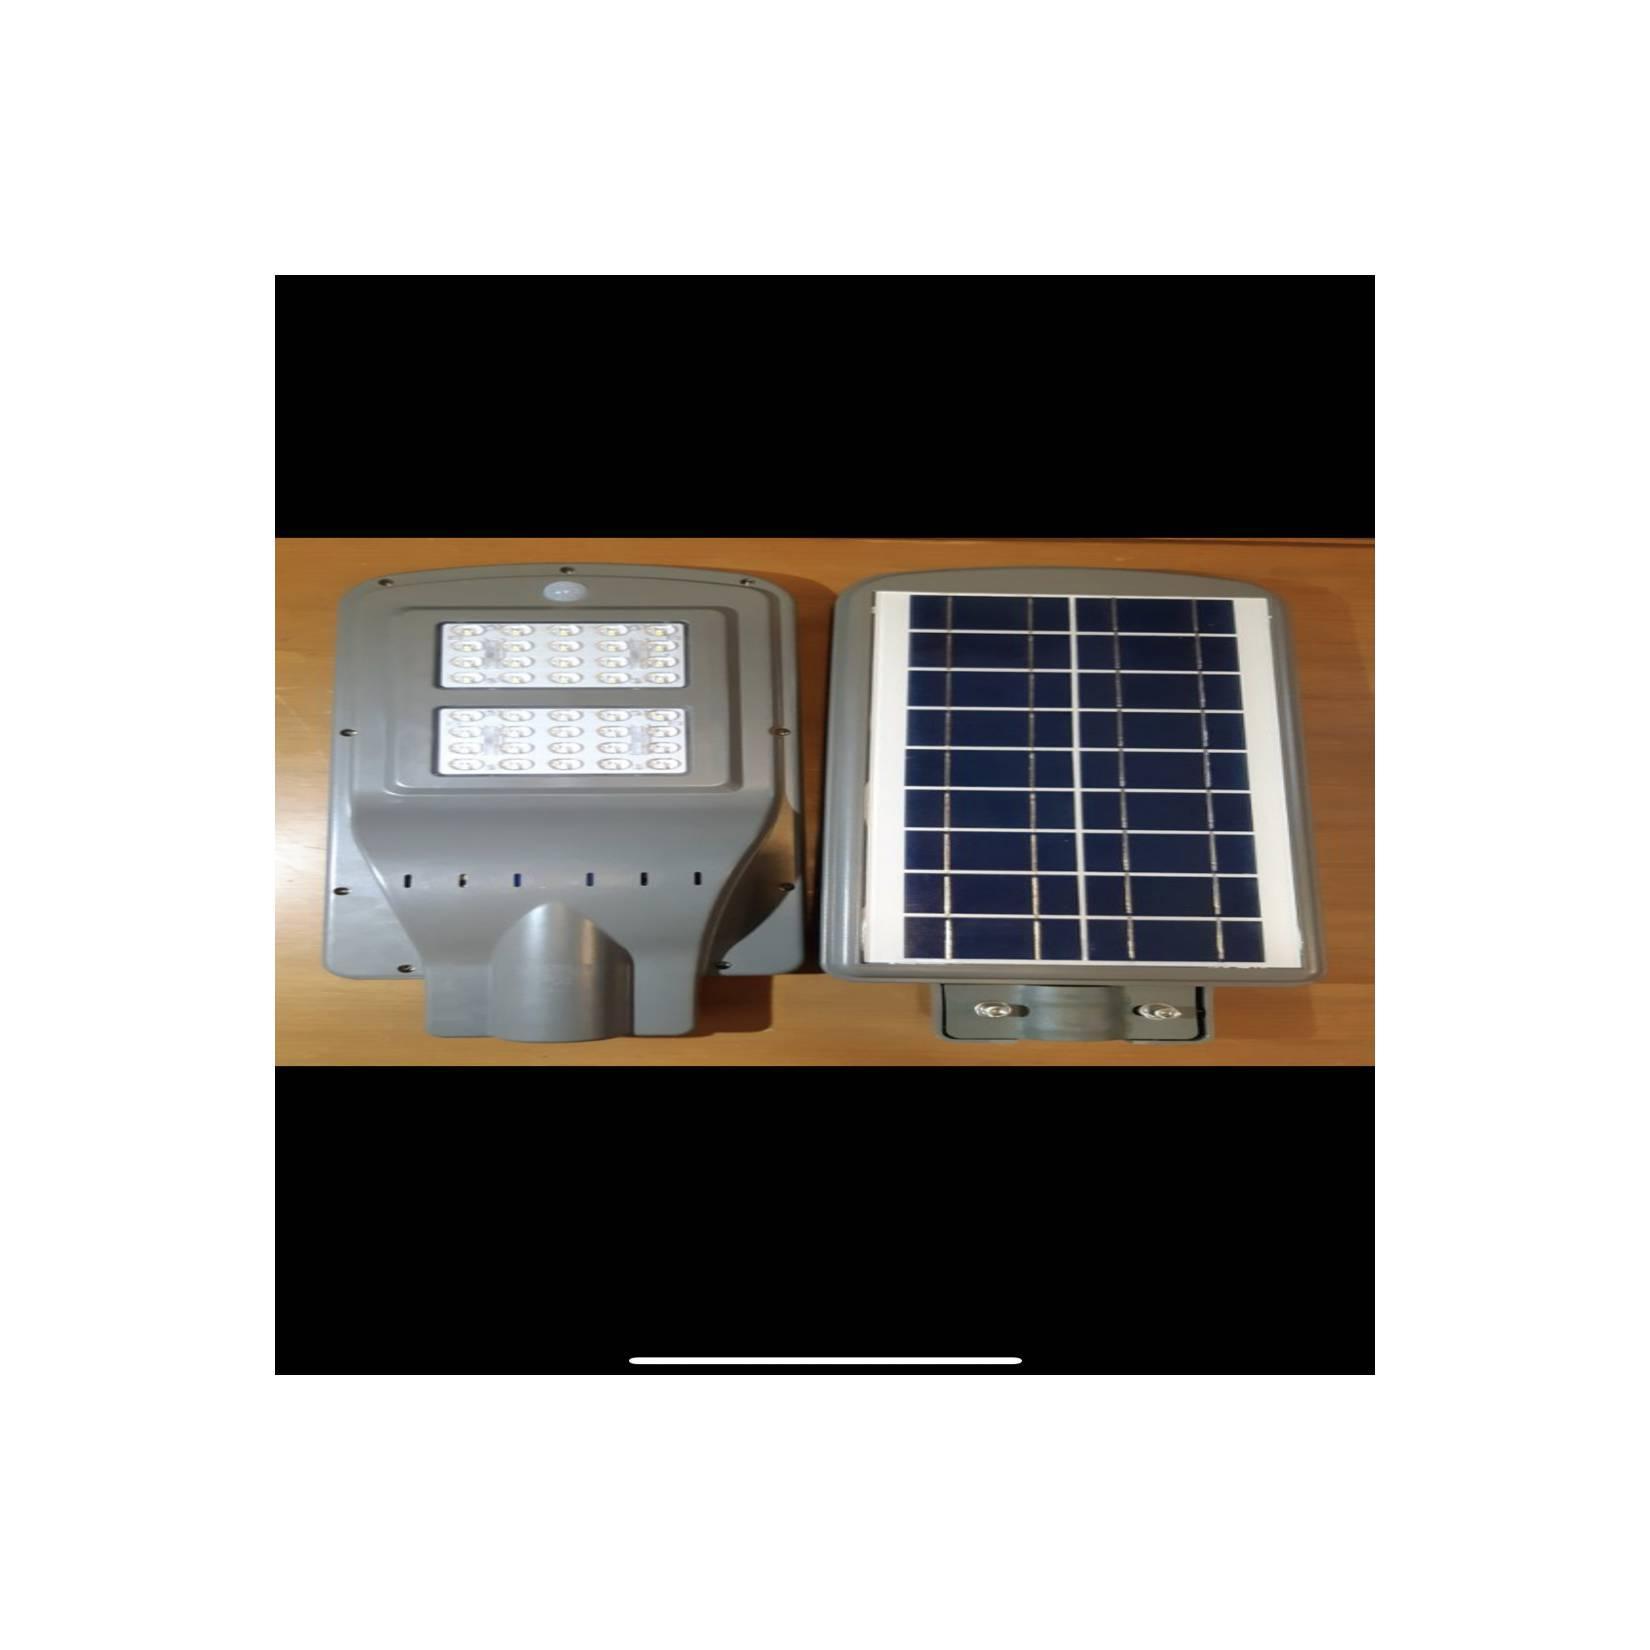 Harga Solar Cell 2200 Watt Termurah - Panel Surya